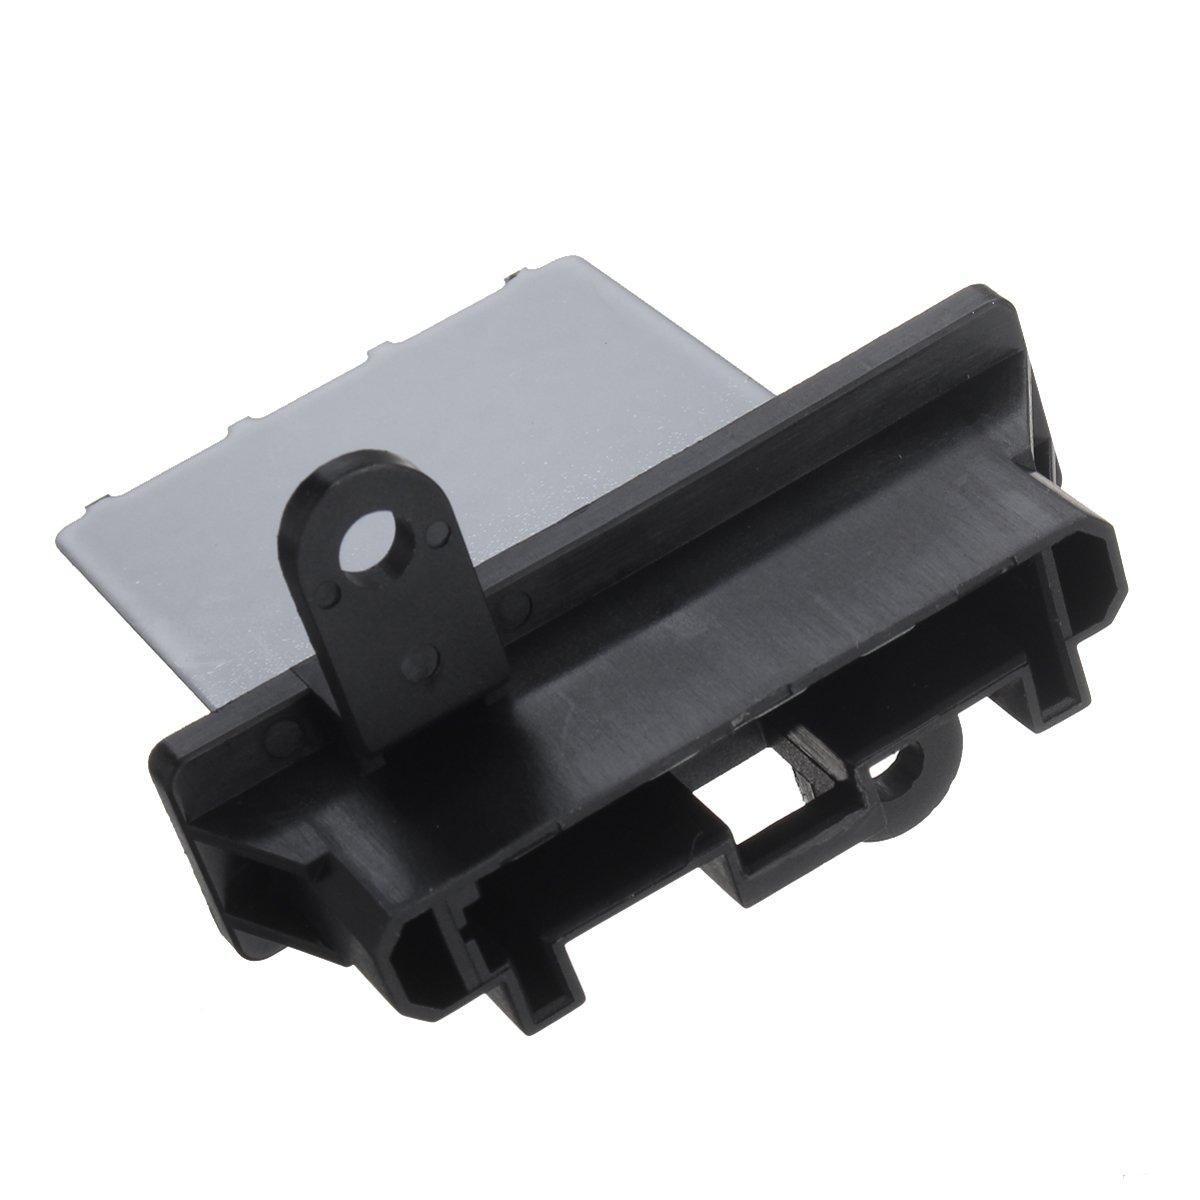 Viviance Car Blower Motor Heater Fan Resistor For Isuzu D-Max Holden//Colorado 2008-2011